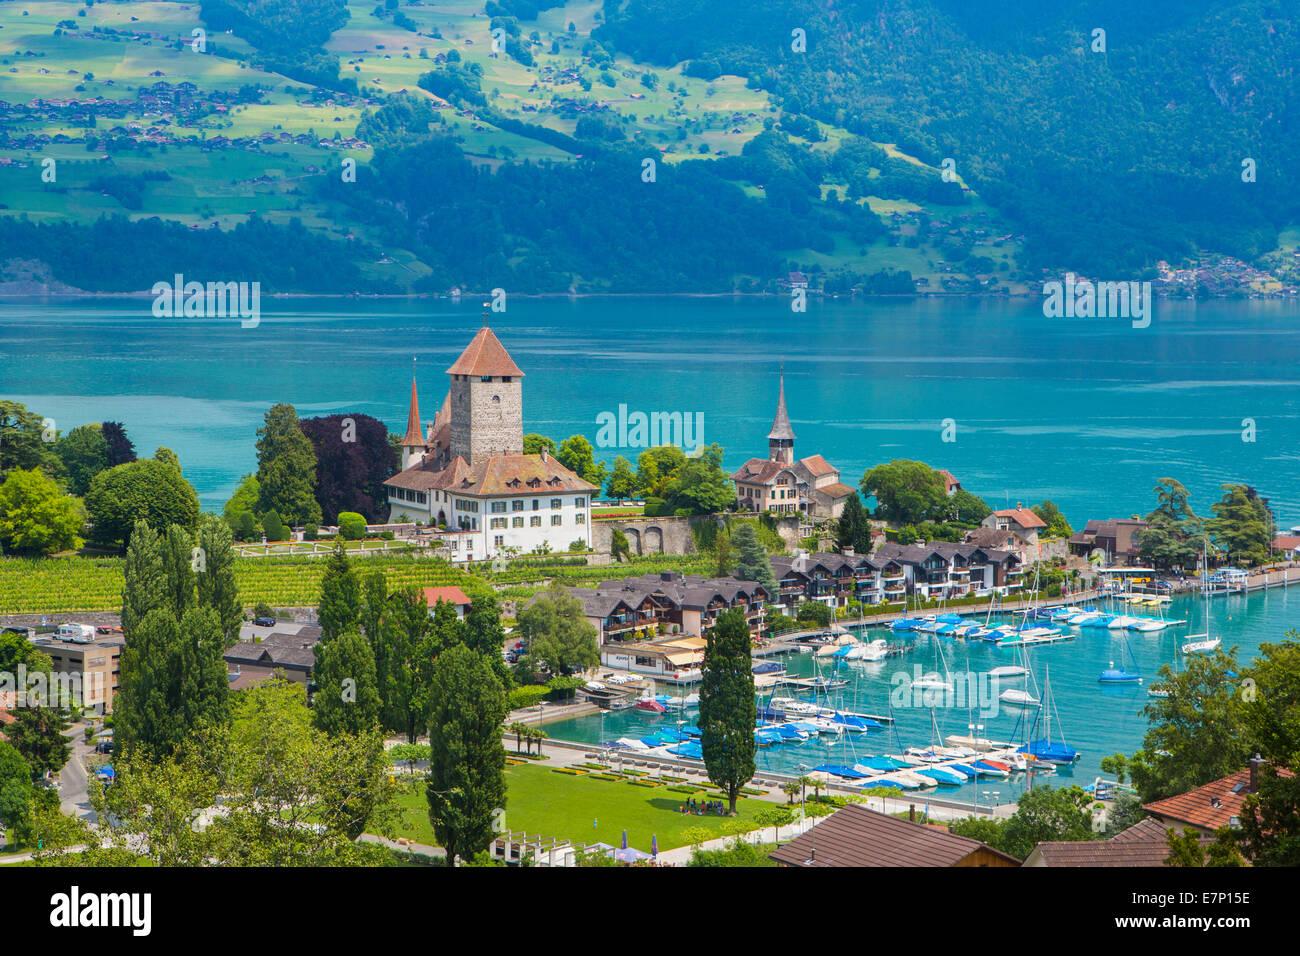 canton Berne, Bernese Oberland, Spiez, Switzerland, Europe, lake Thun, architecture, boats, city, colourful, lake, - Stock Image